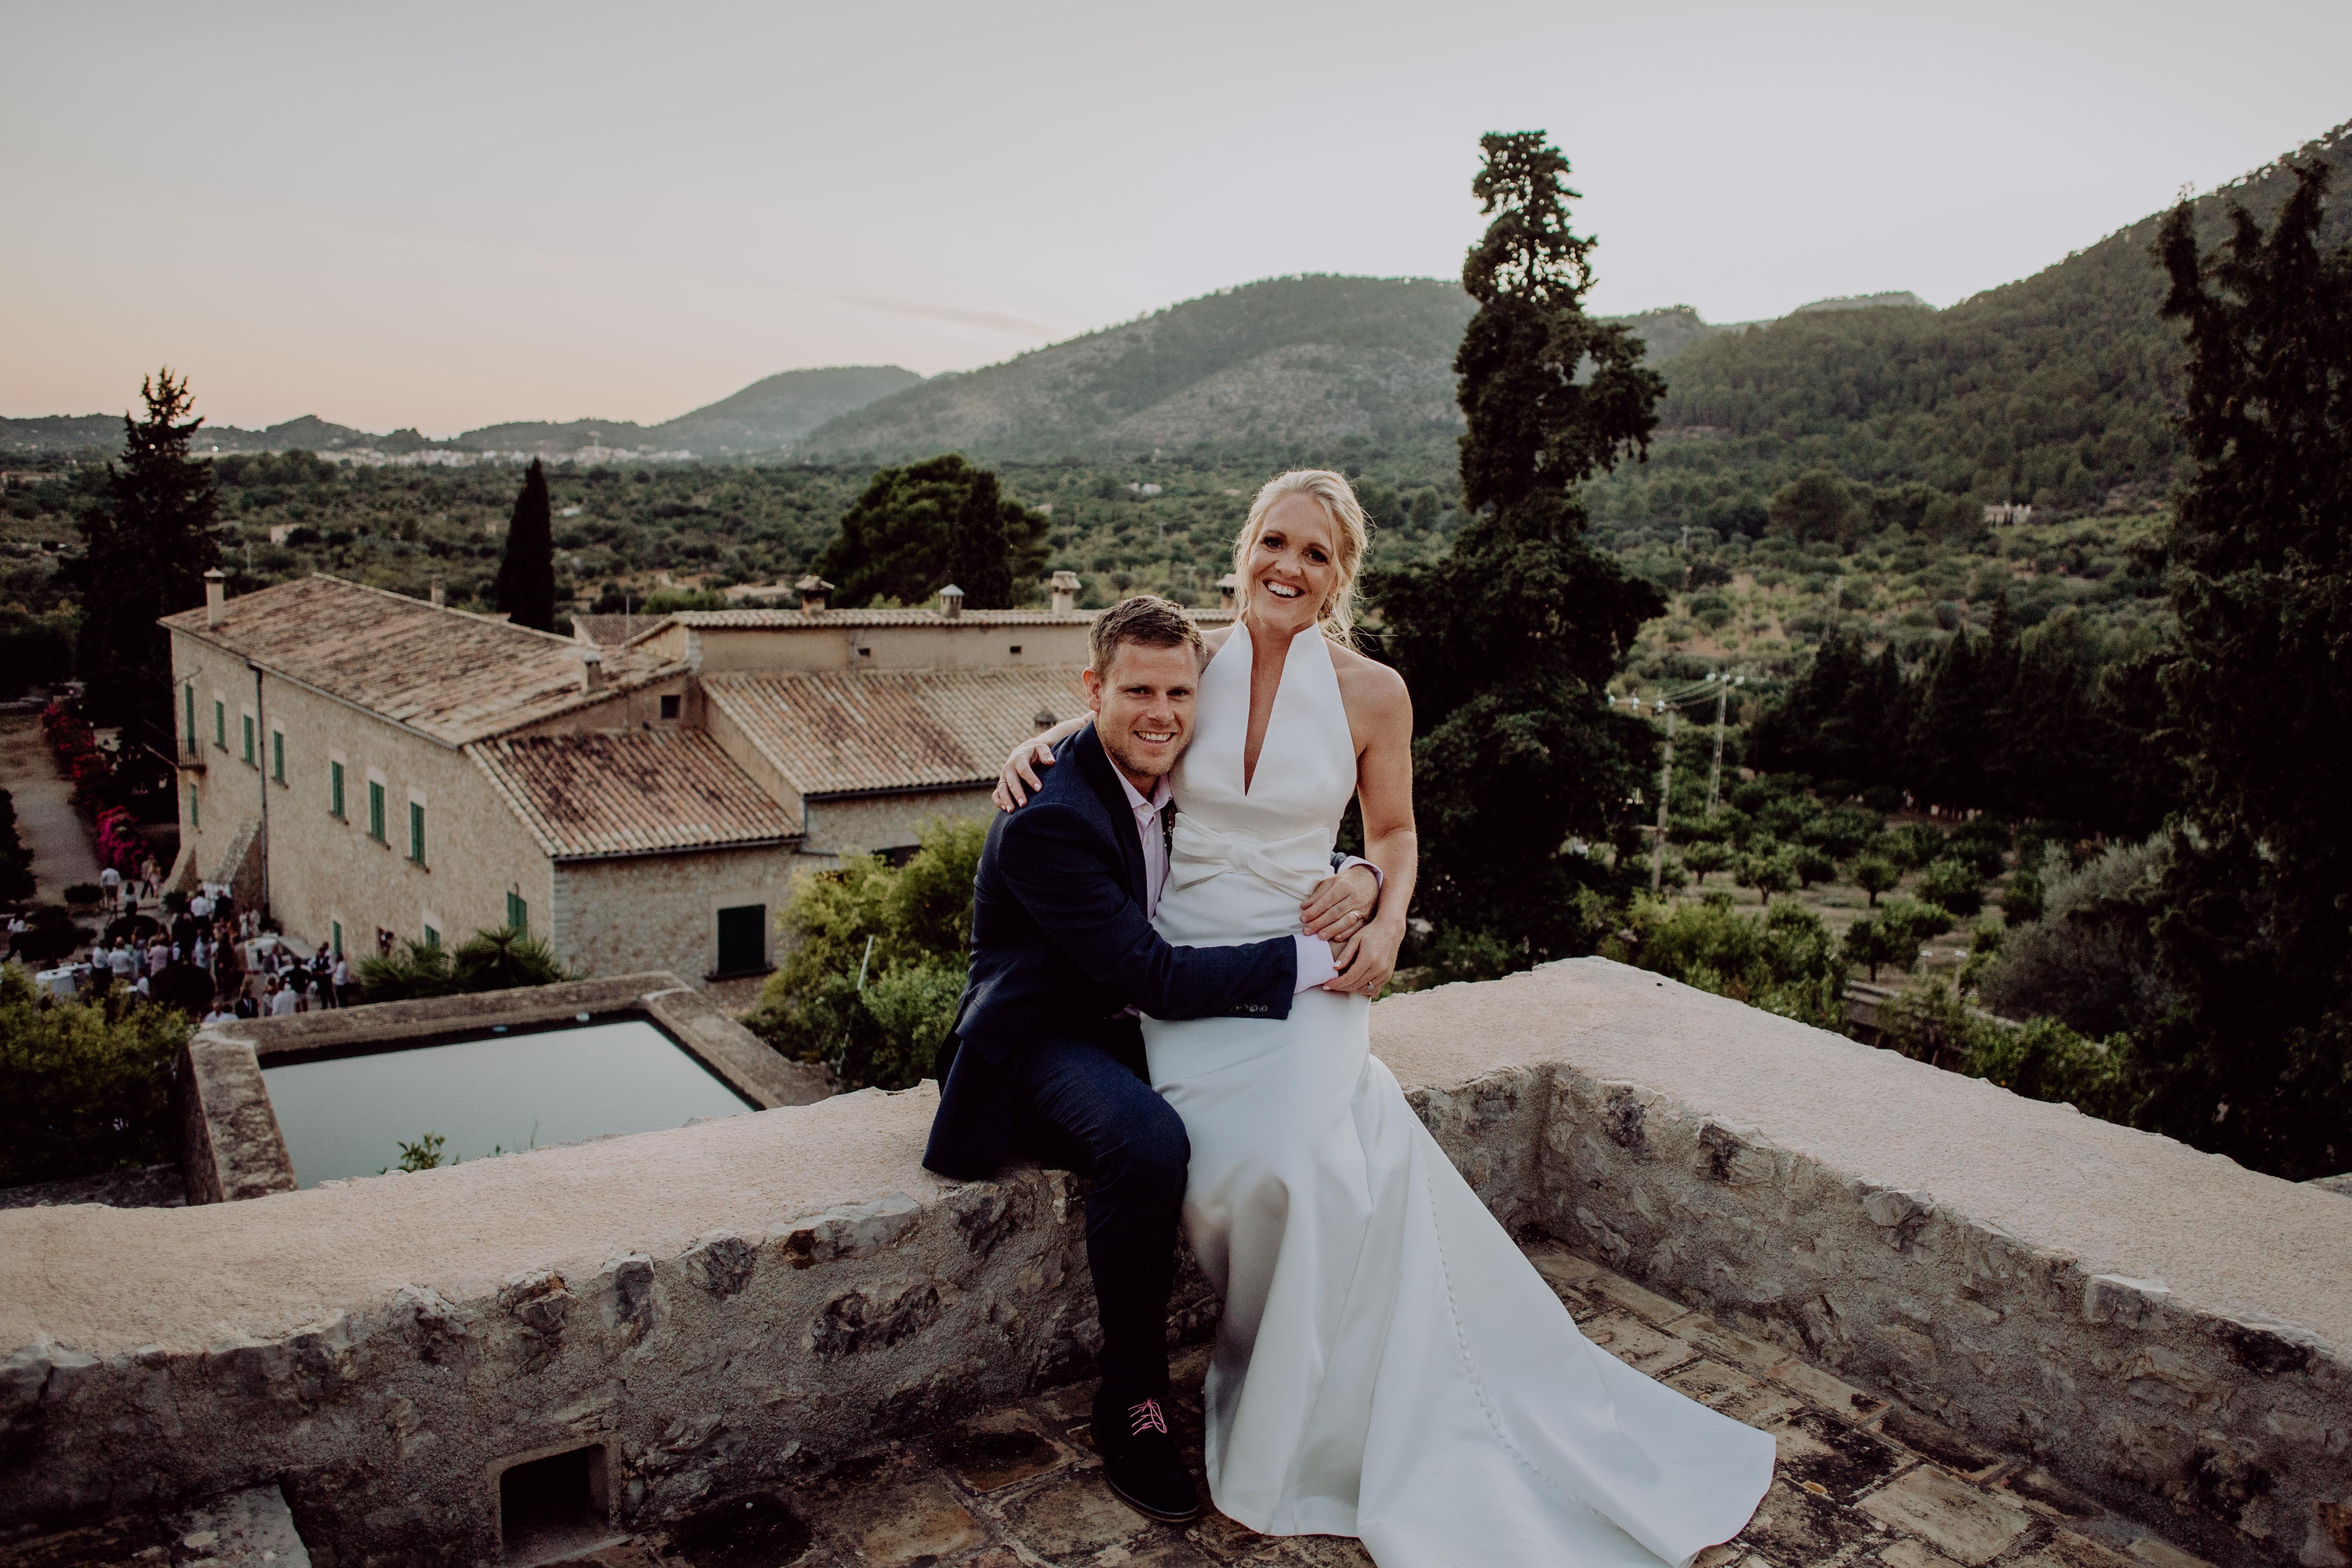 Megan married her love in Jesus Peiro